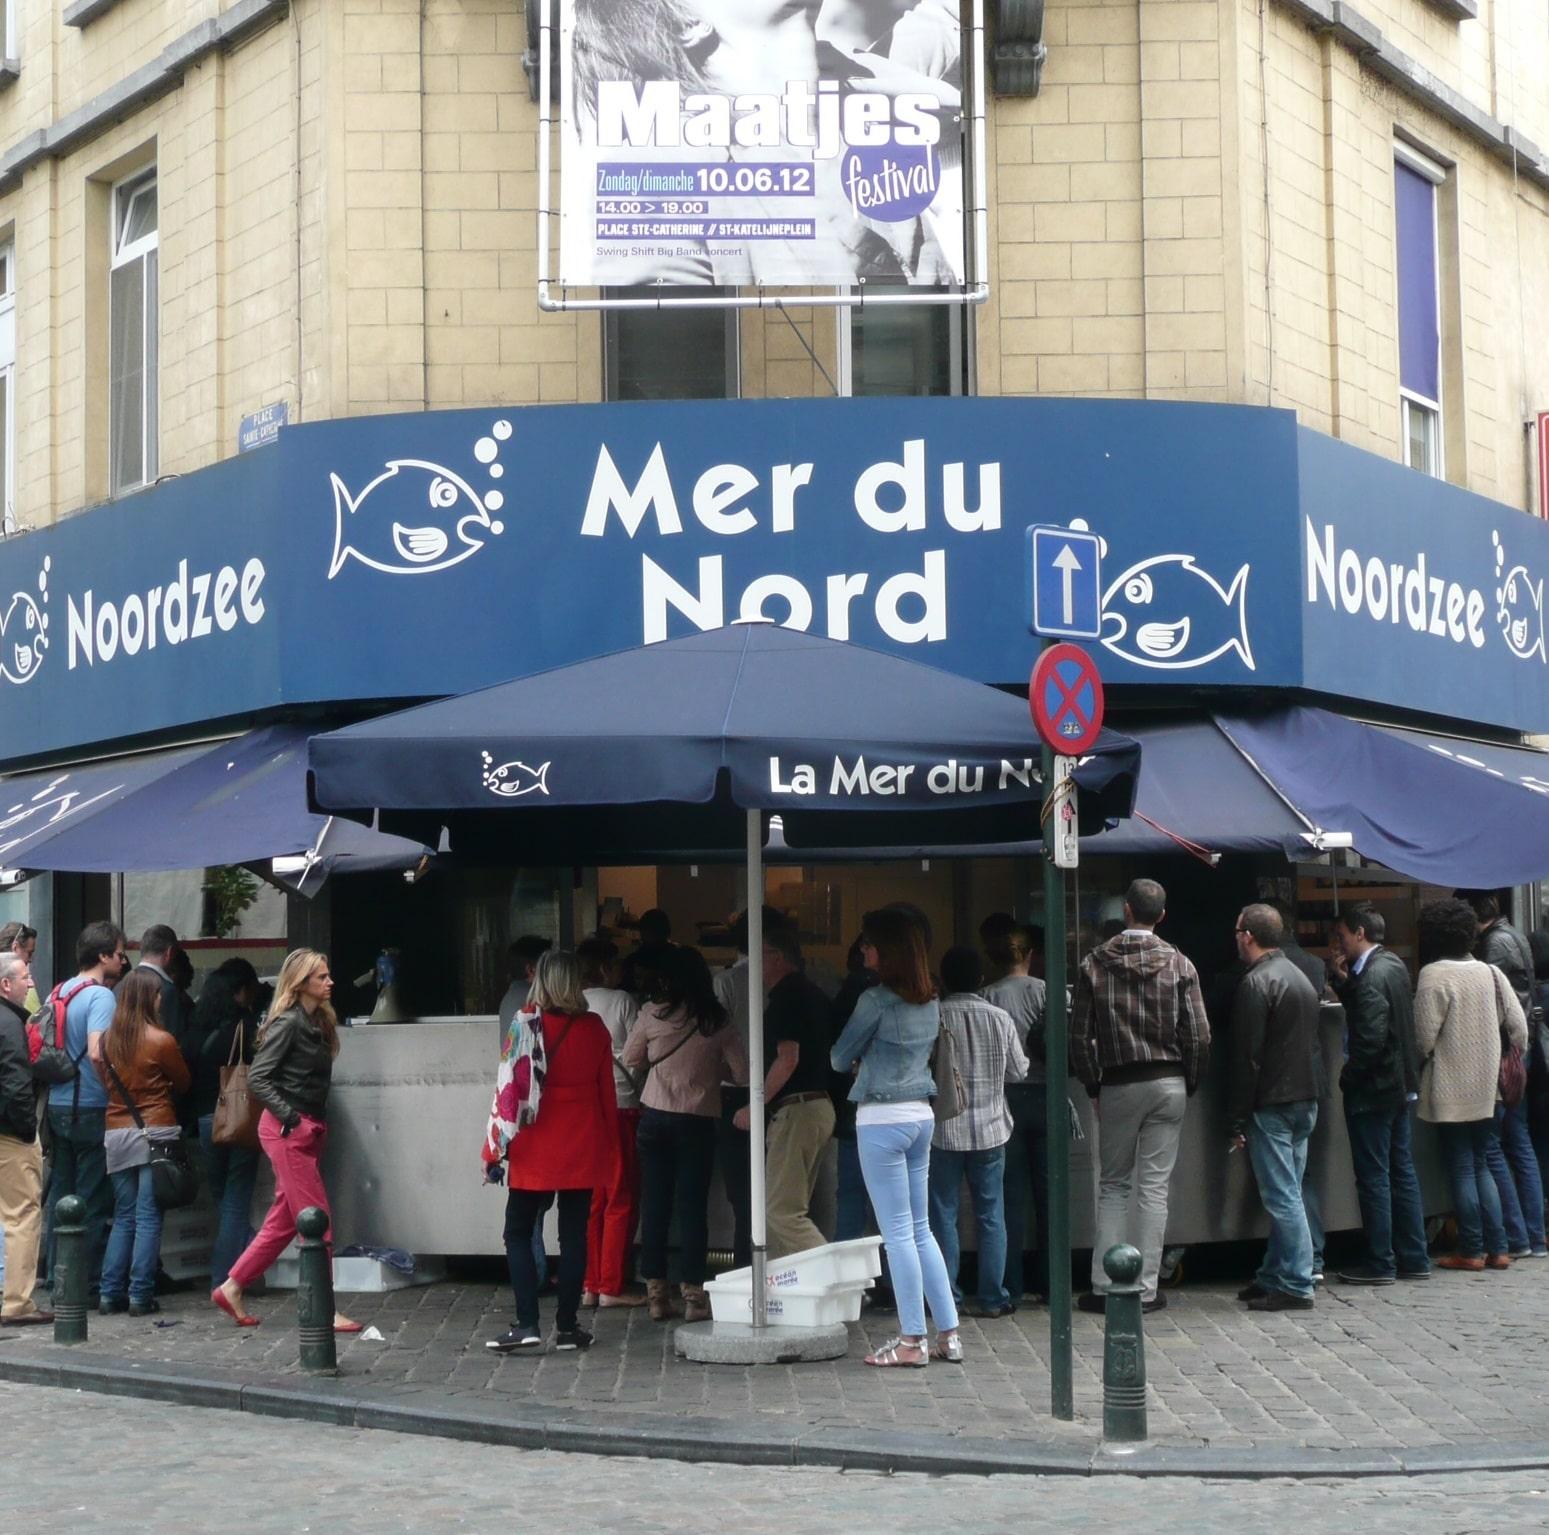 Restaurants in Brussels 2